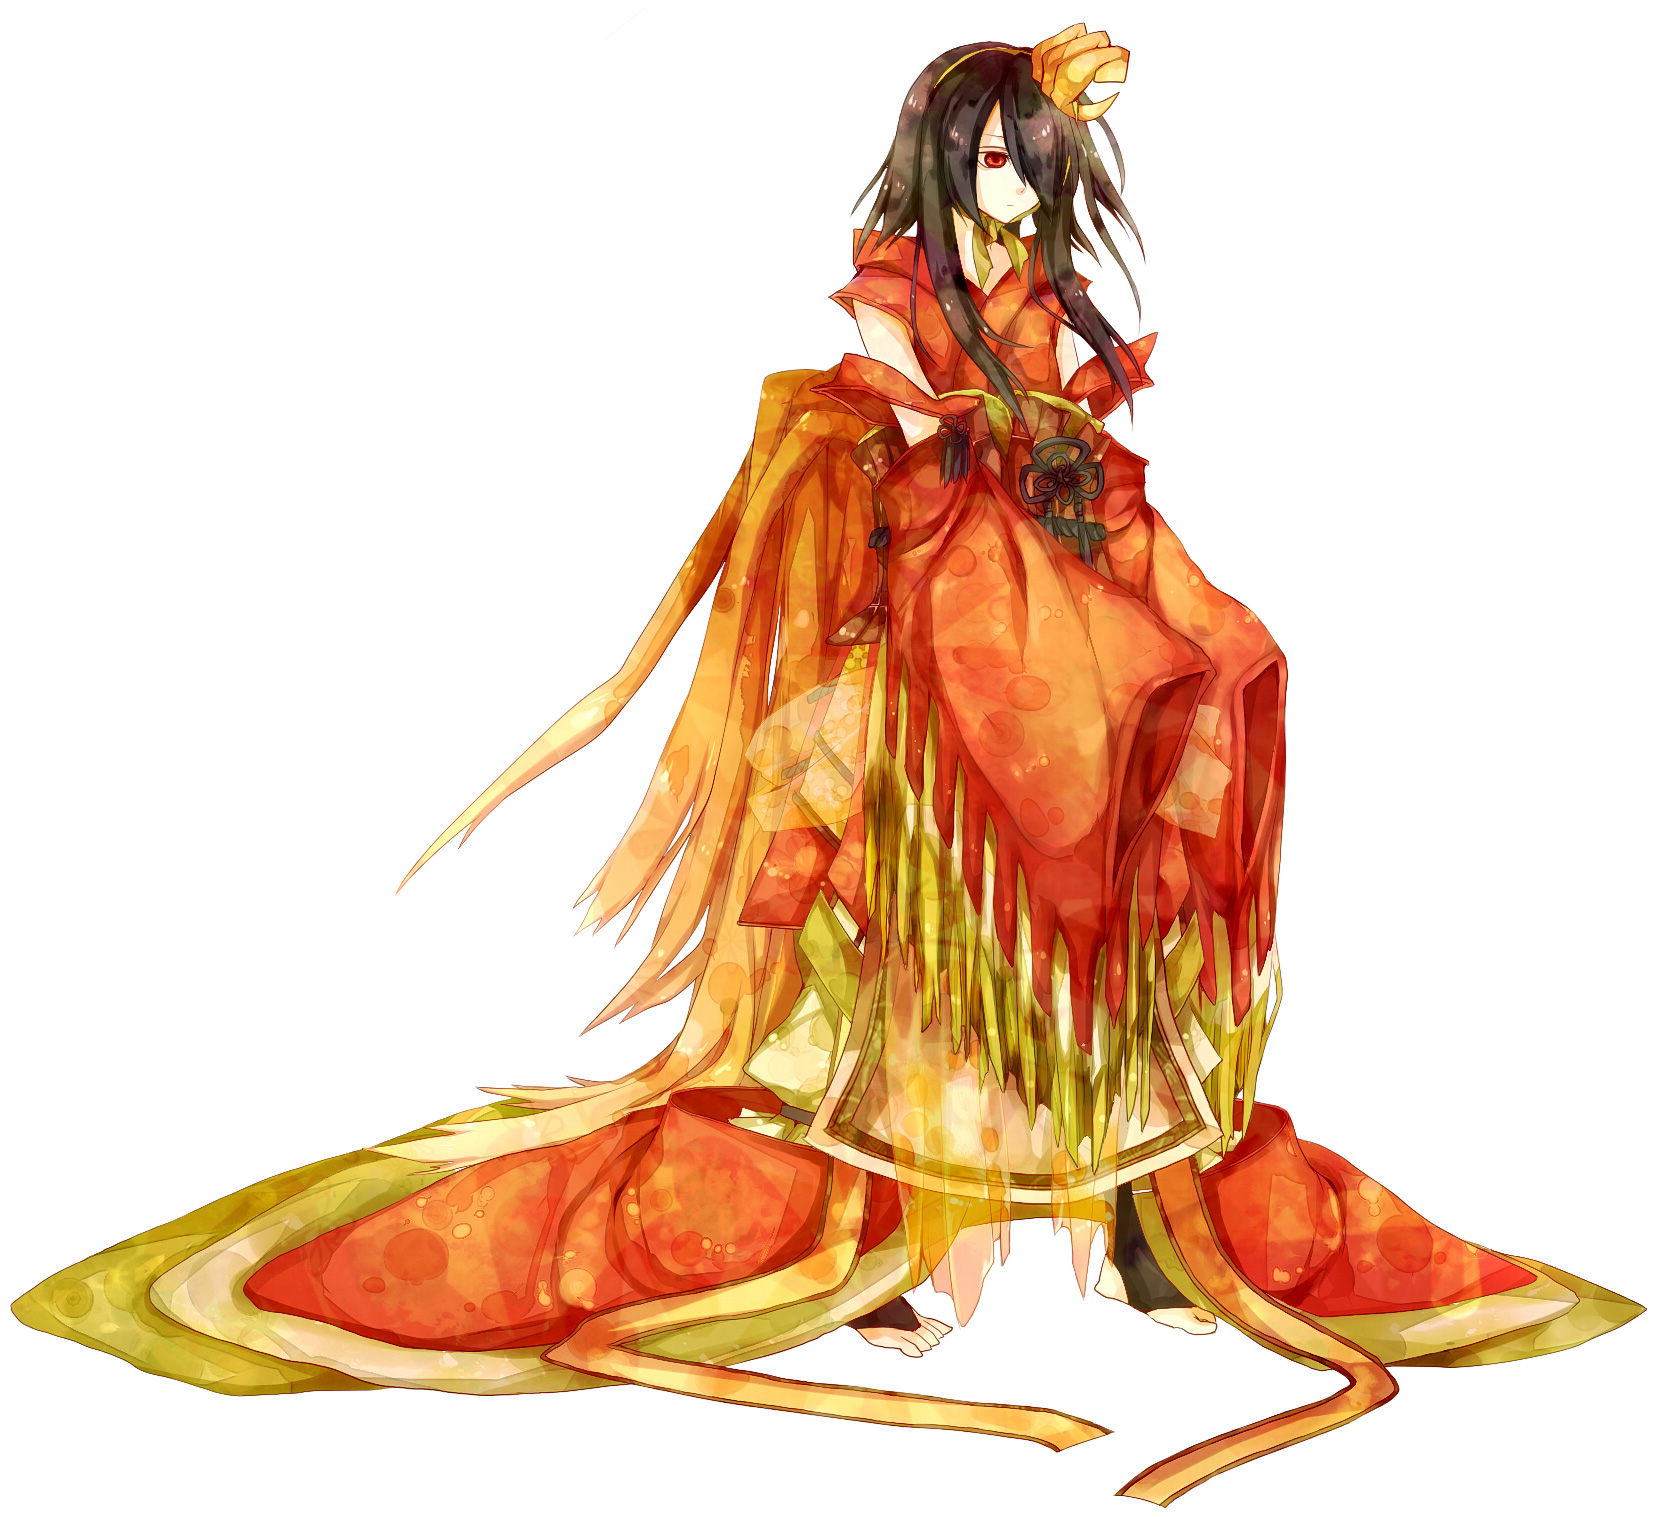 Ho Oh Pok 233 Mon Image 153793 Zerochan Anime Image Board